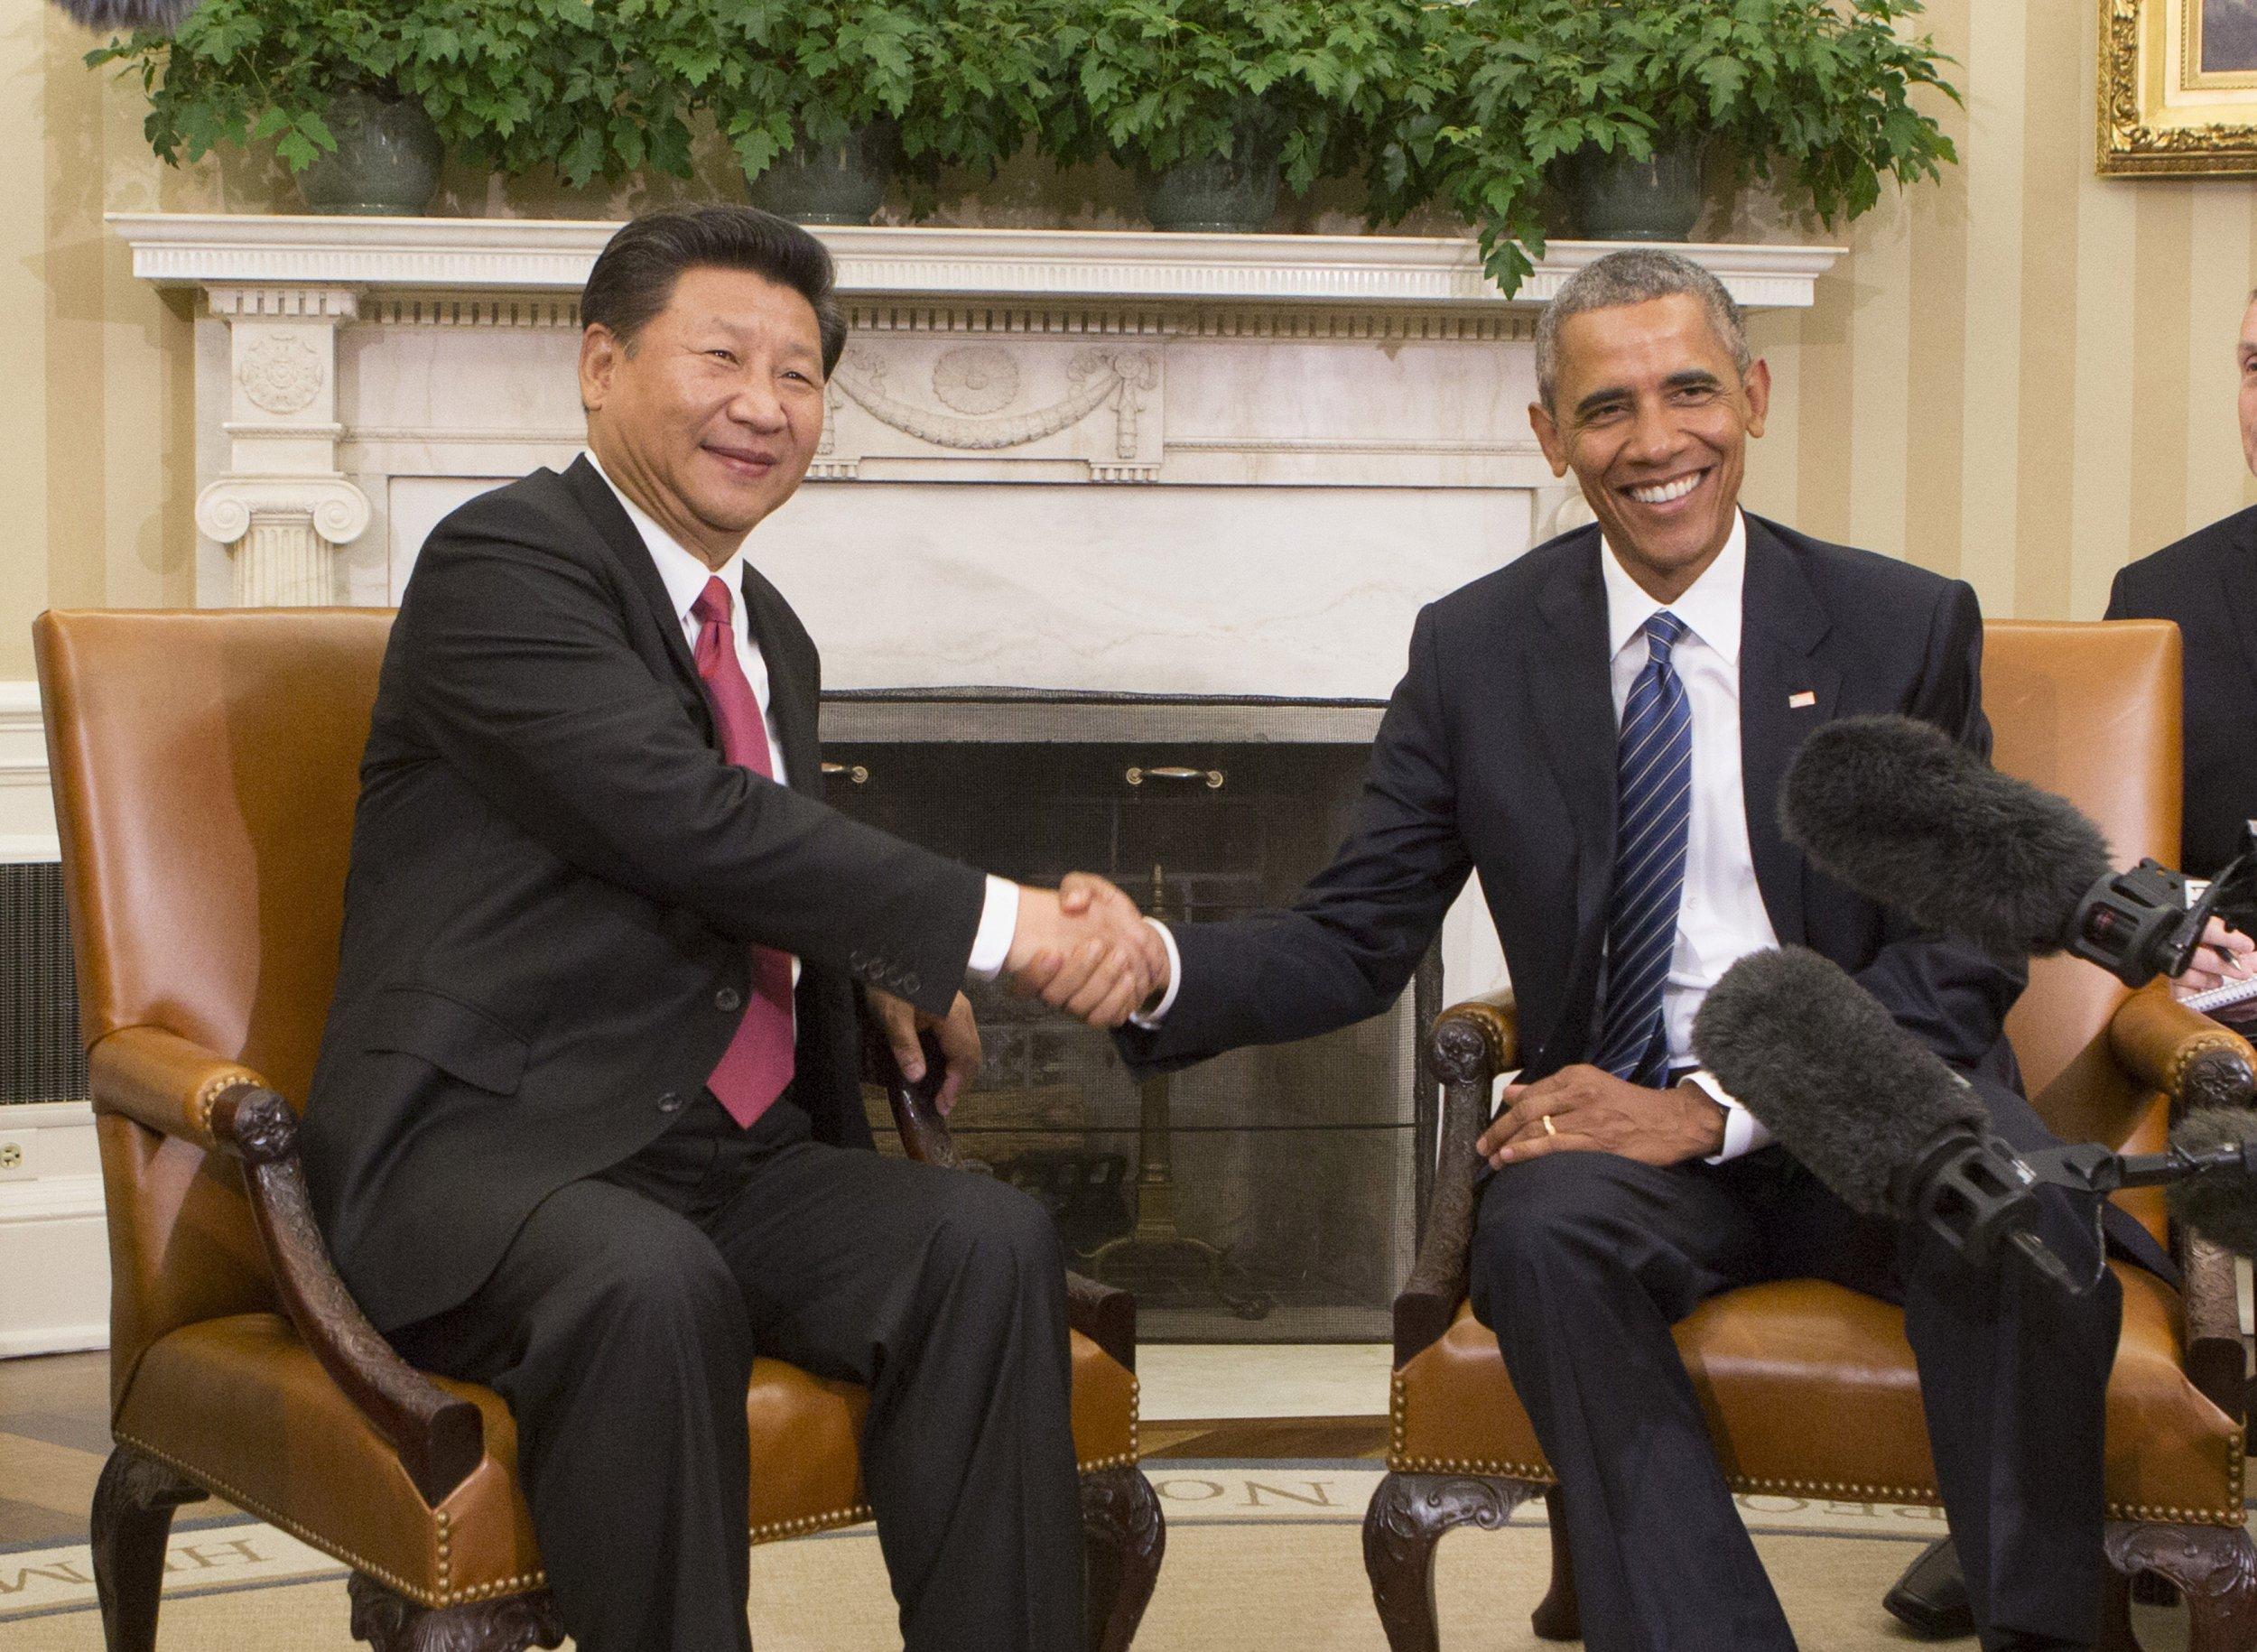 XI Jinping, Obama